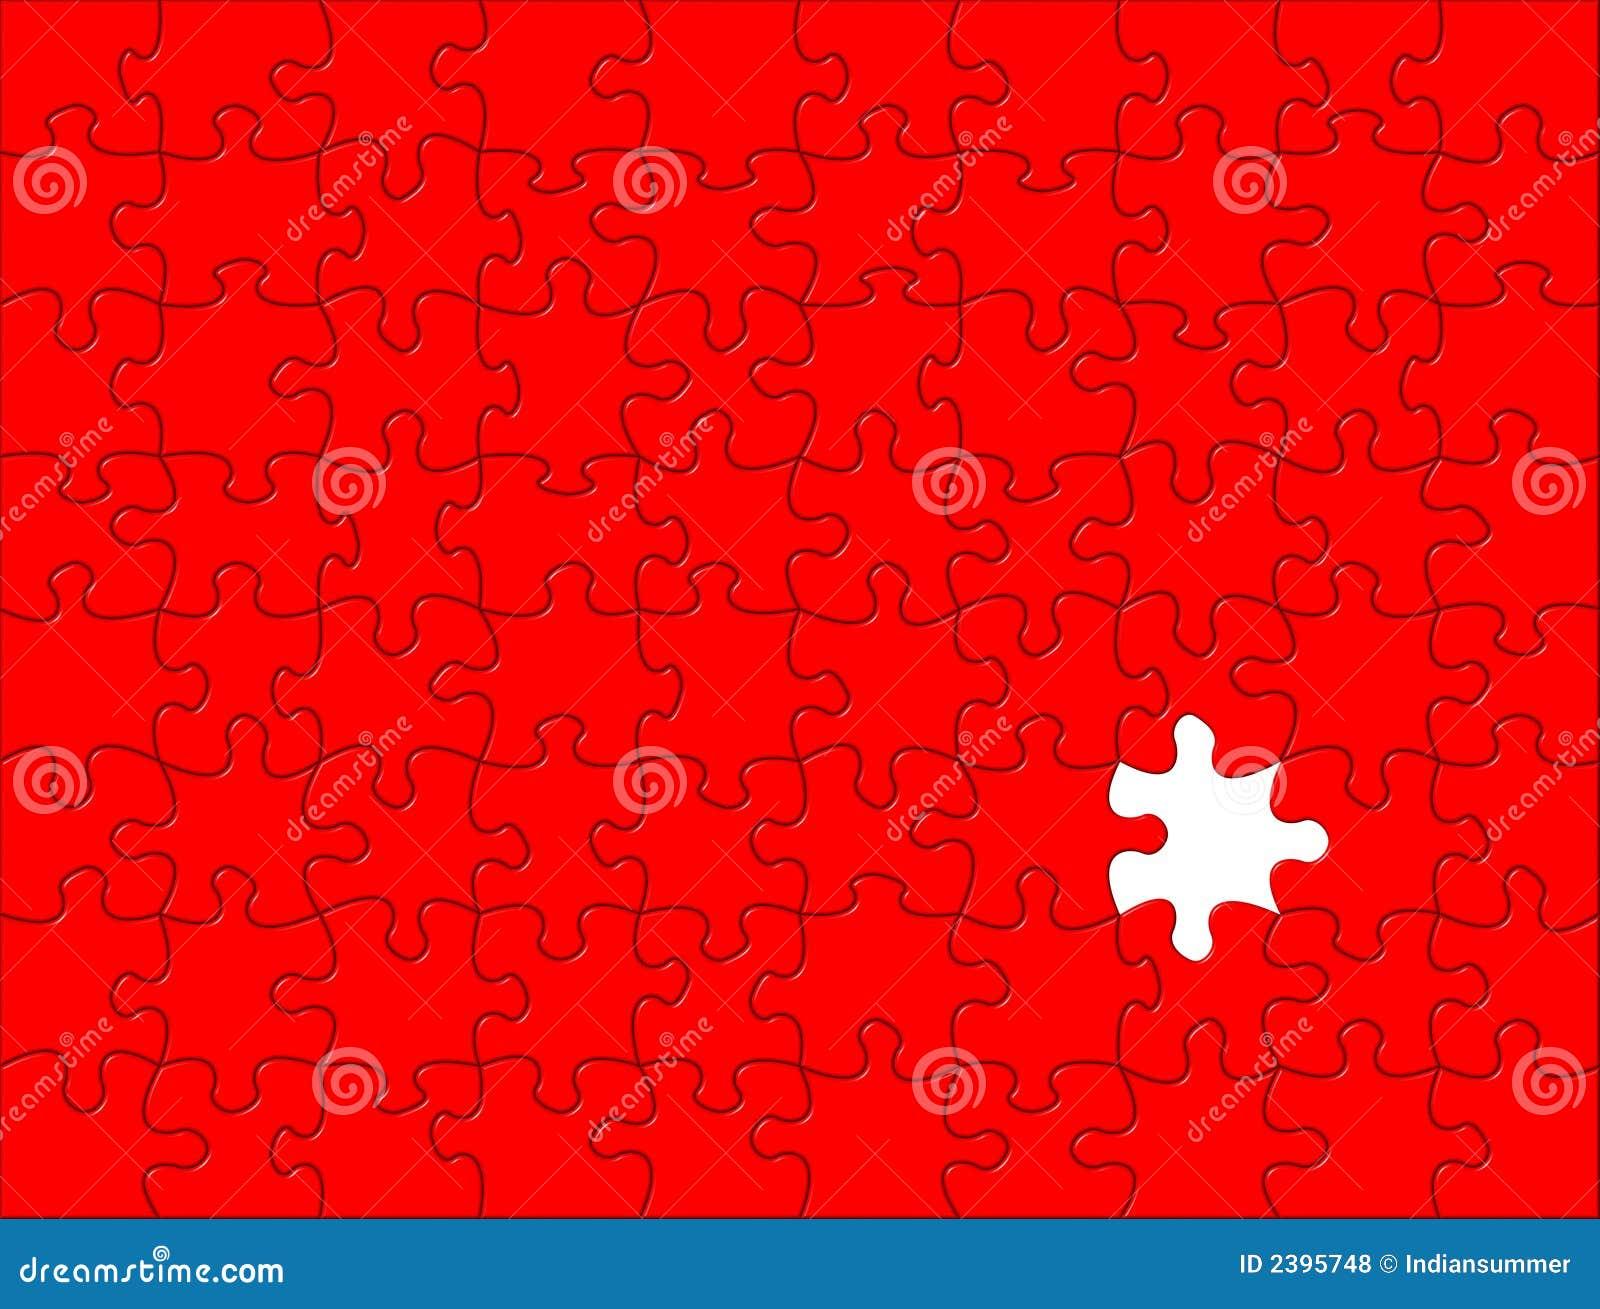 red puzzle background stock illustration illustration of